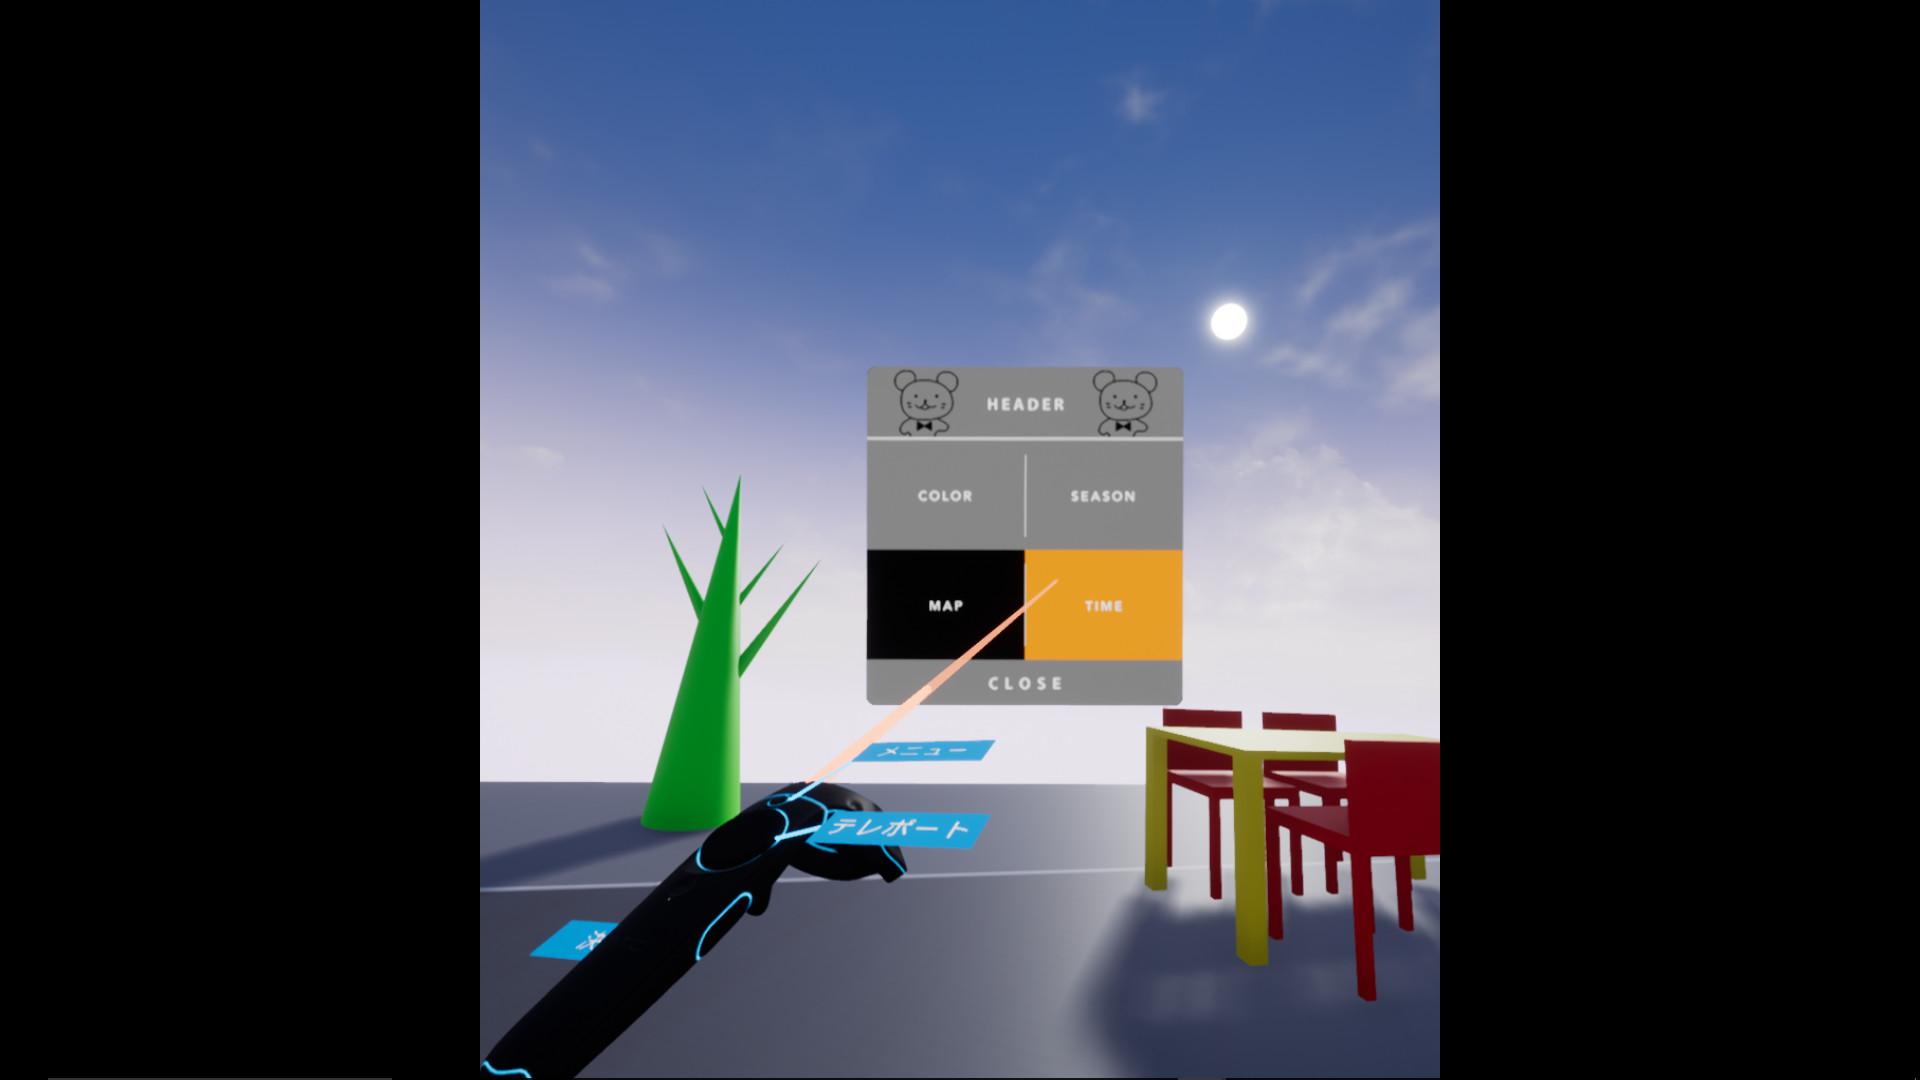 daisuke inoue - Daibond VR UI Template Download free-Unreal